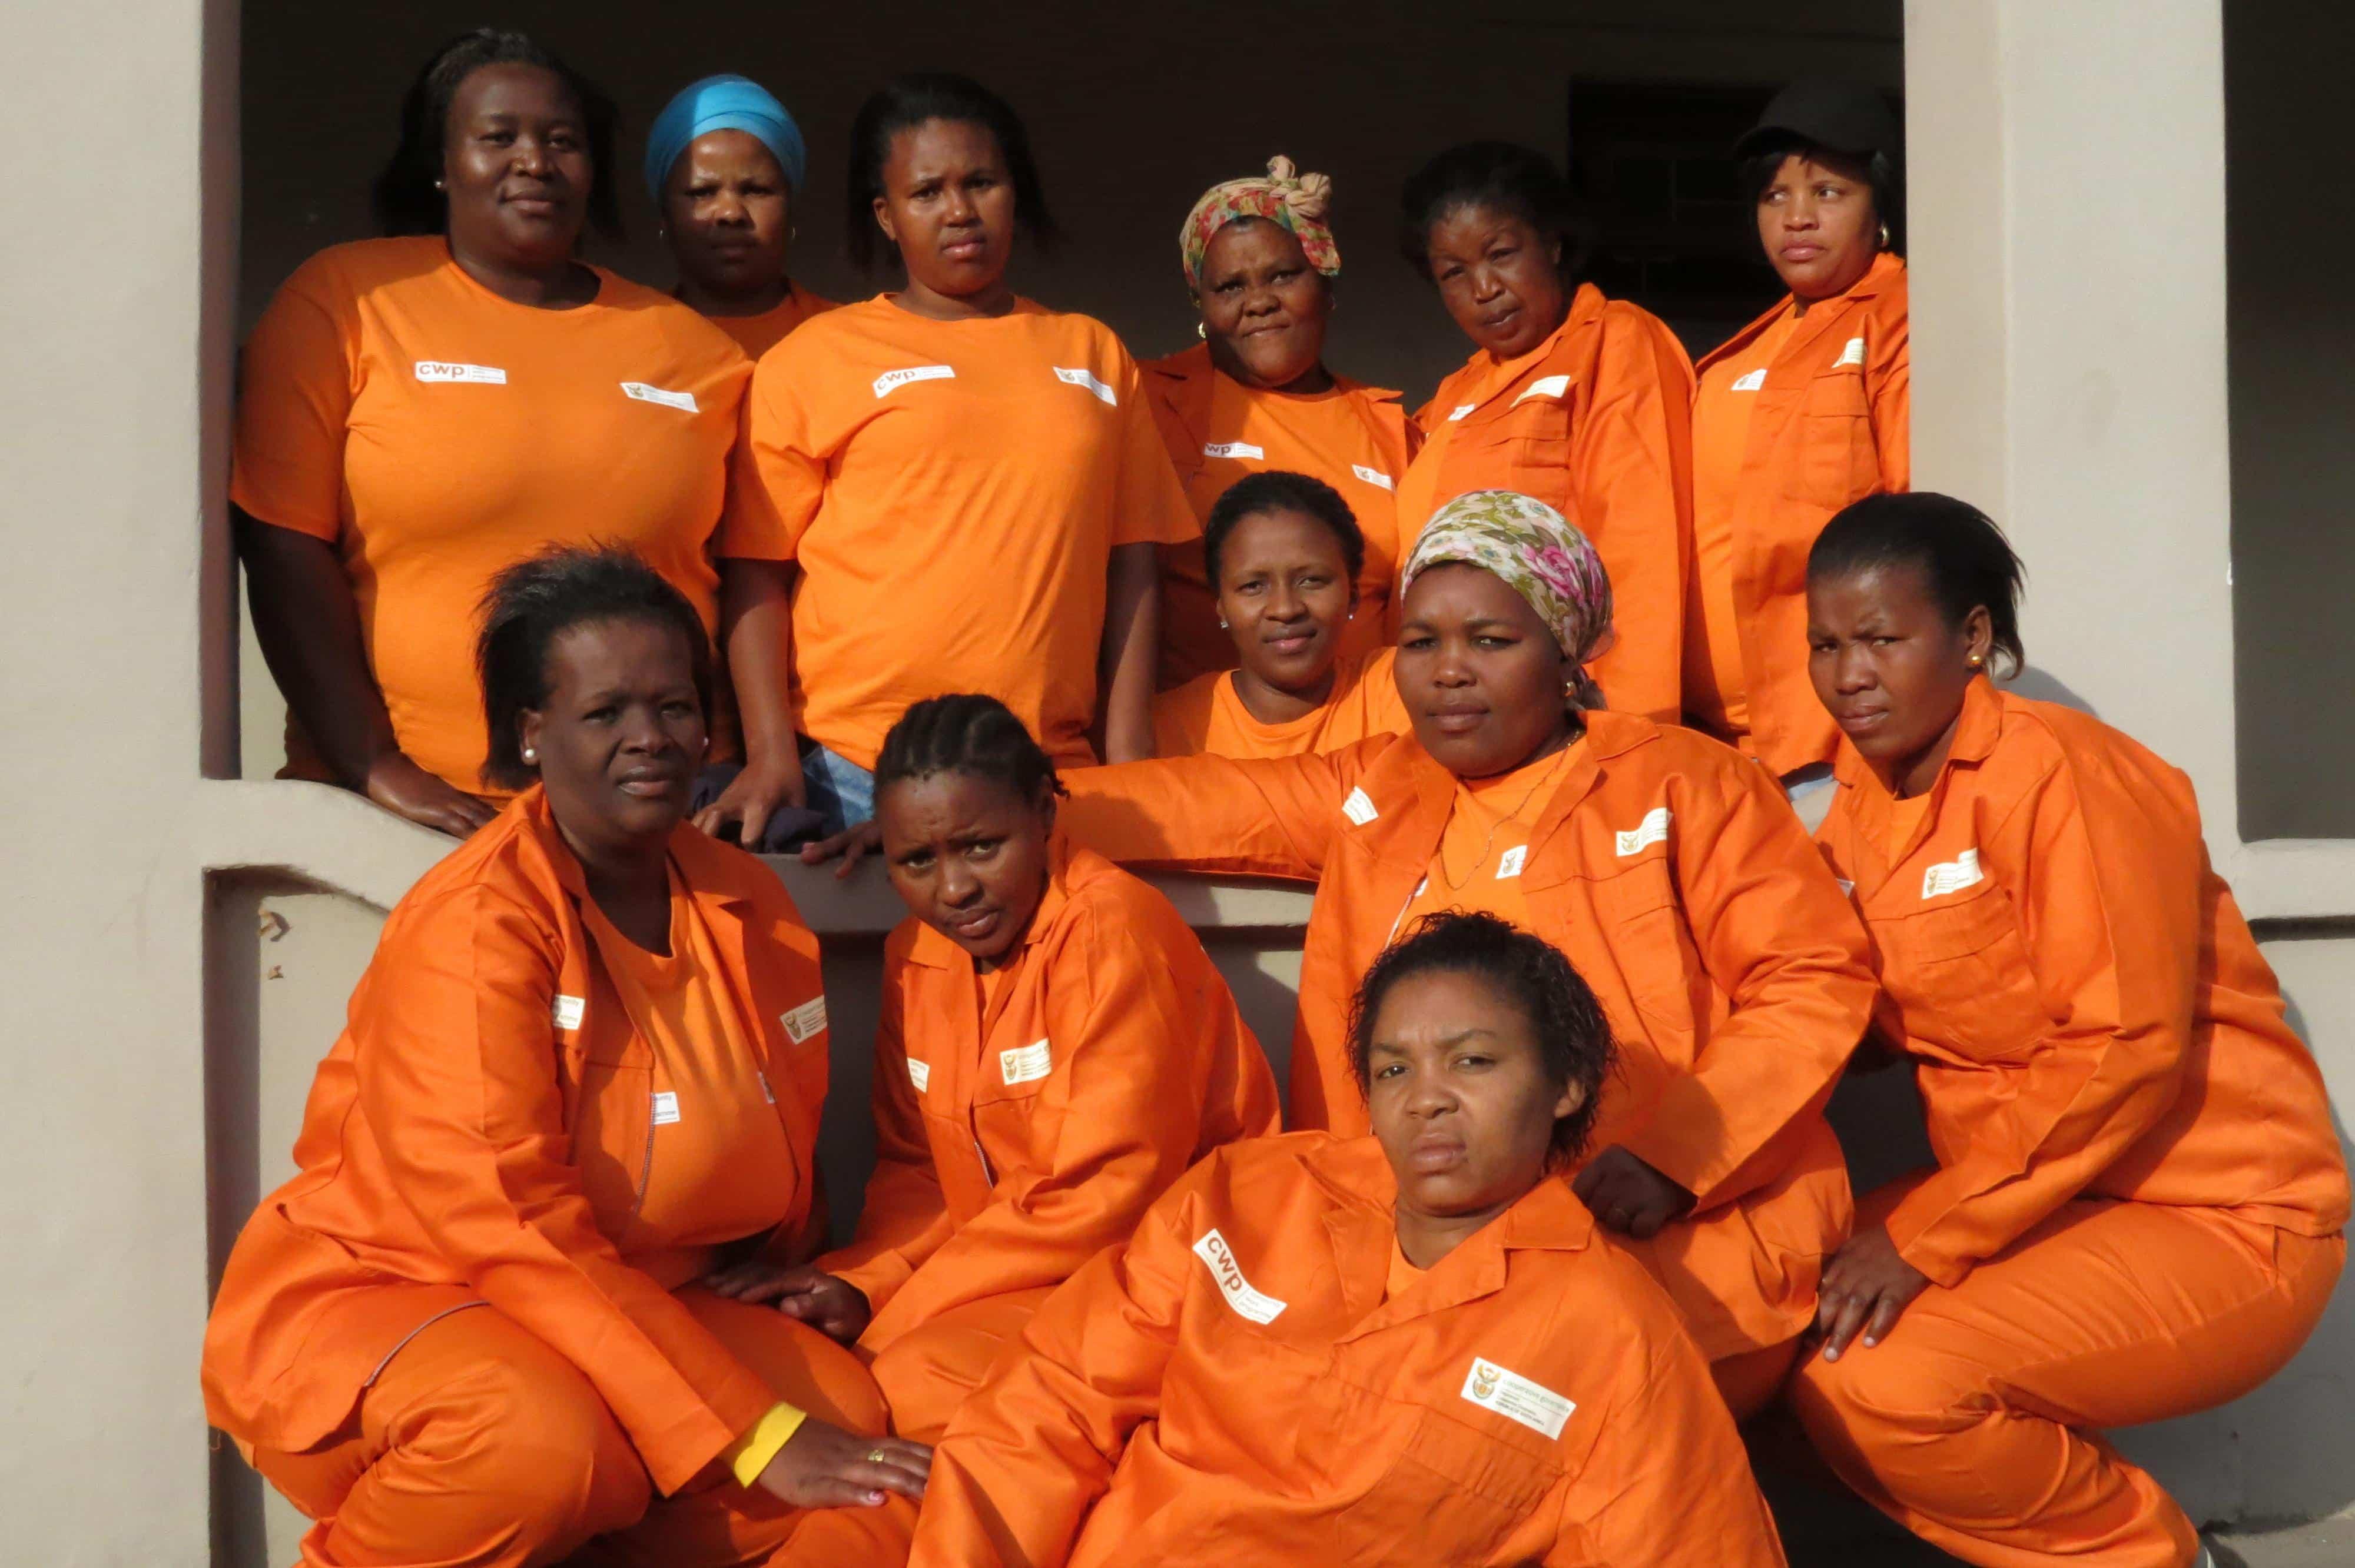 Knysna single women - Meet single ladies from Knysna South Africa